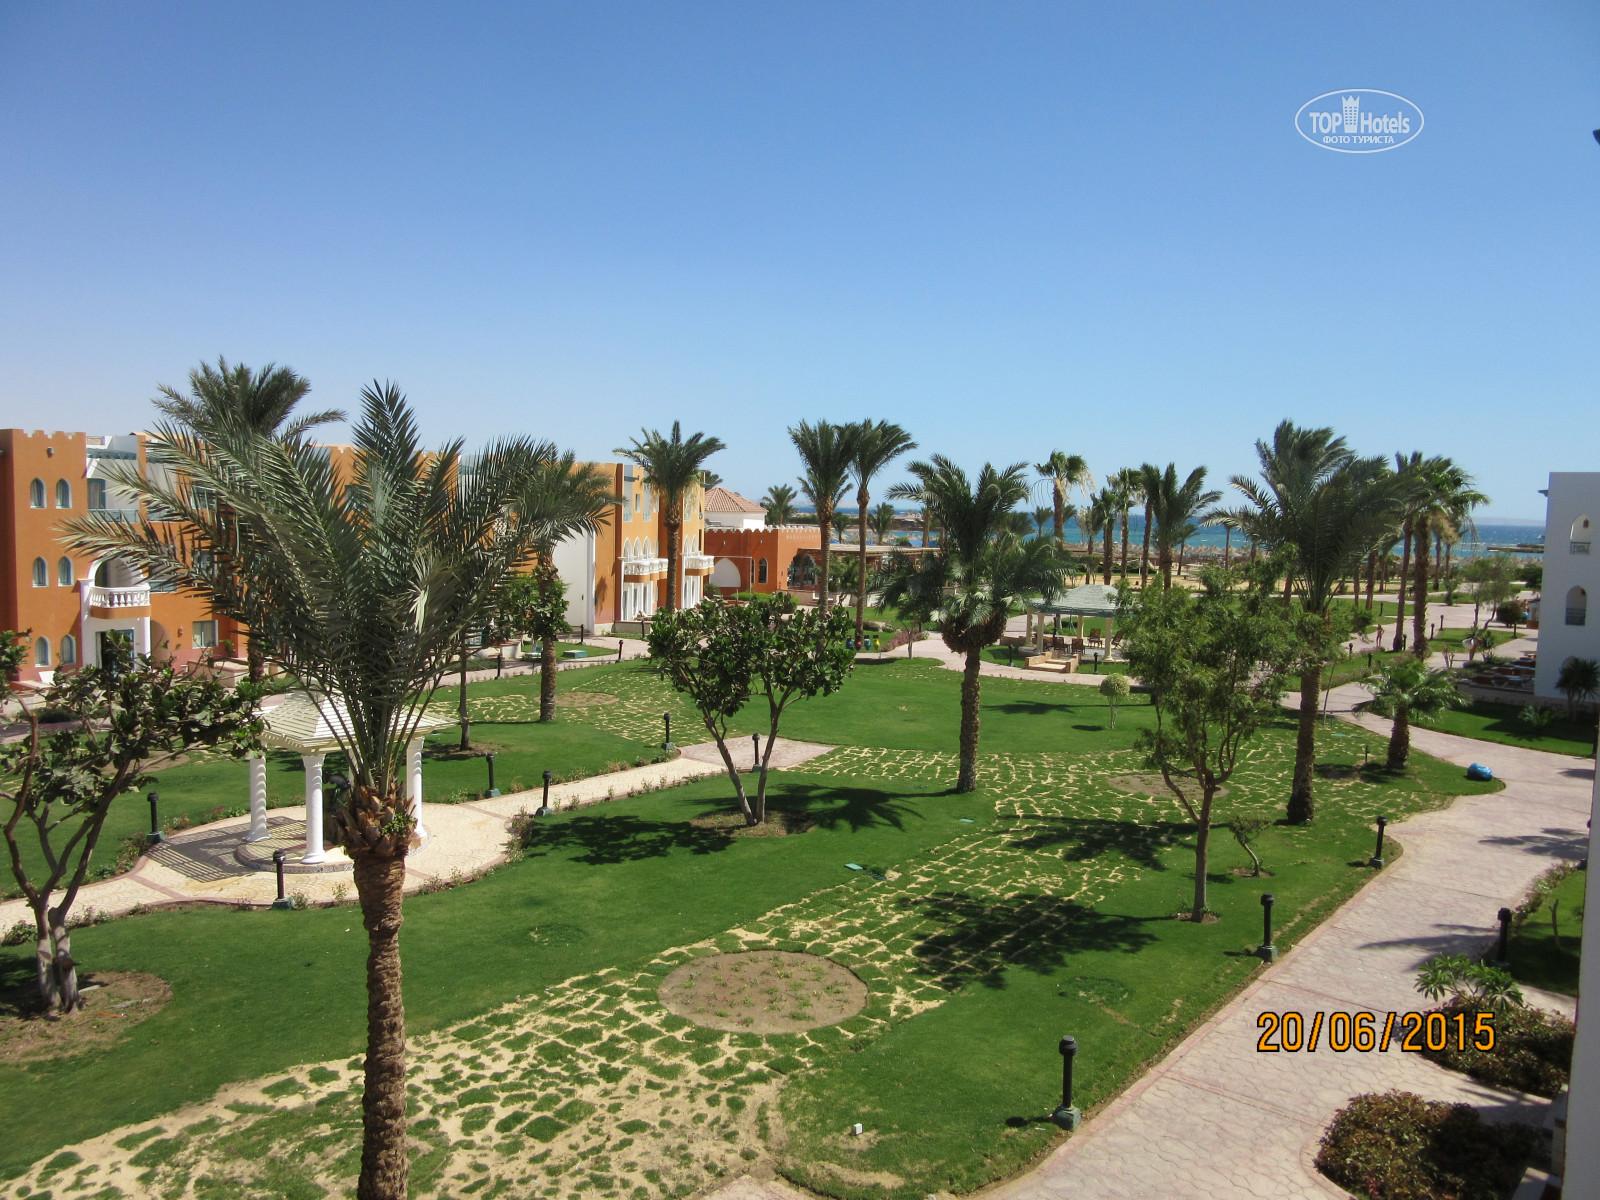 All photos: View from the room отеля Sunrise Select Garden Beach ...